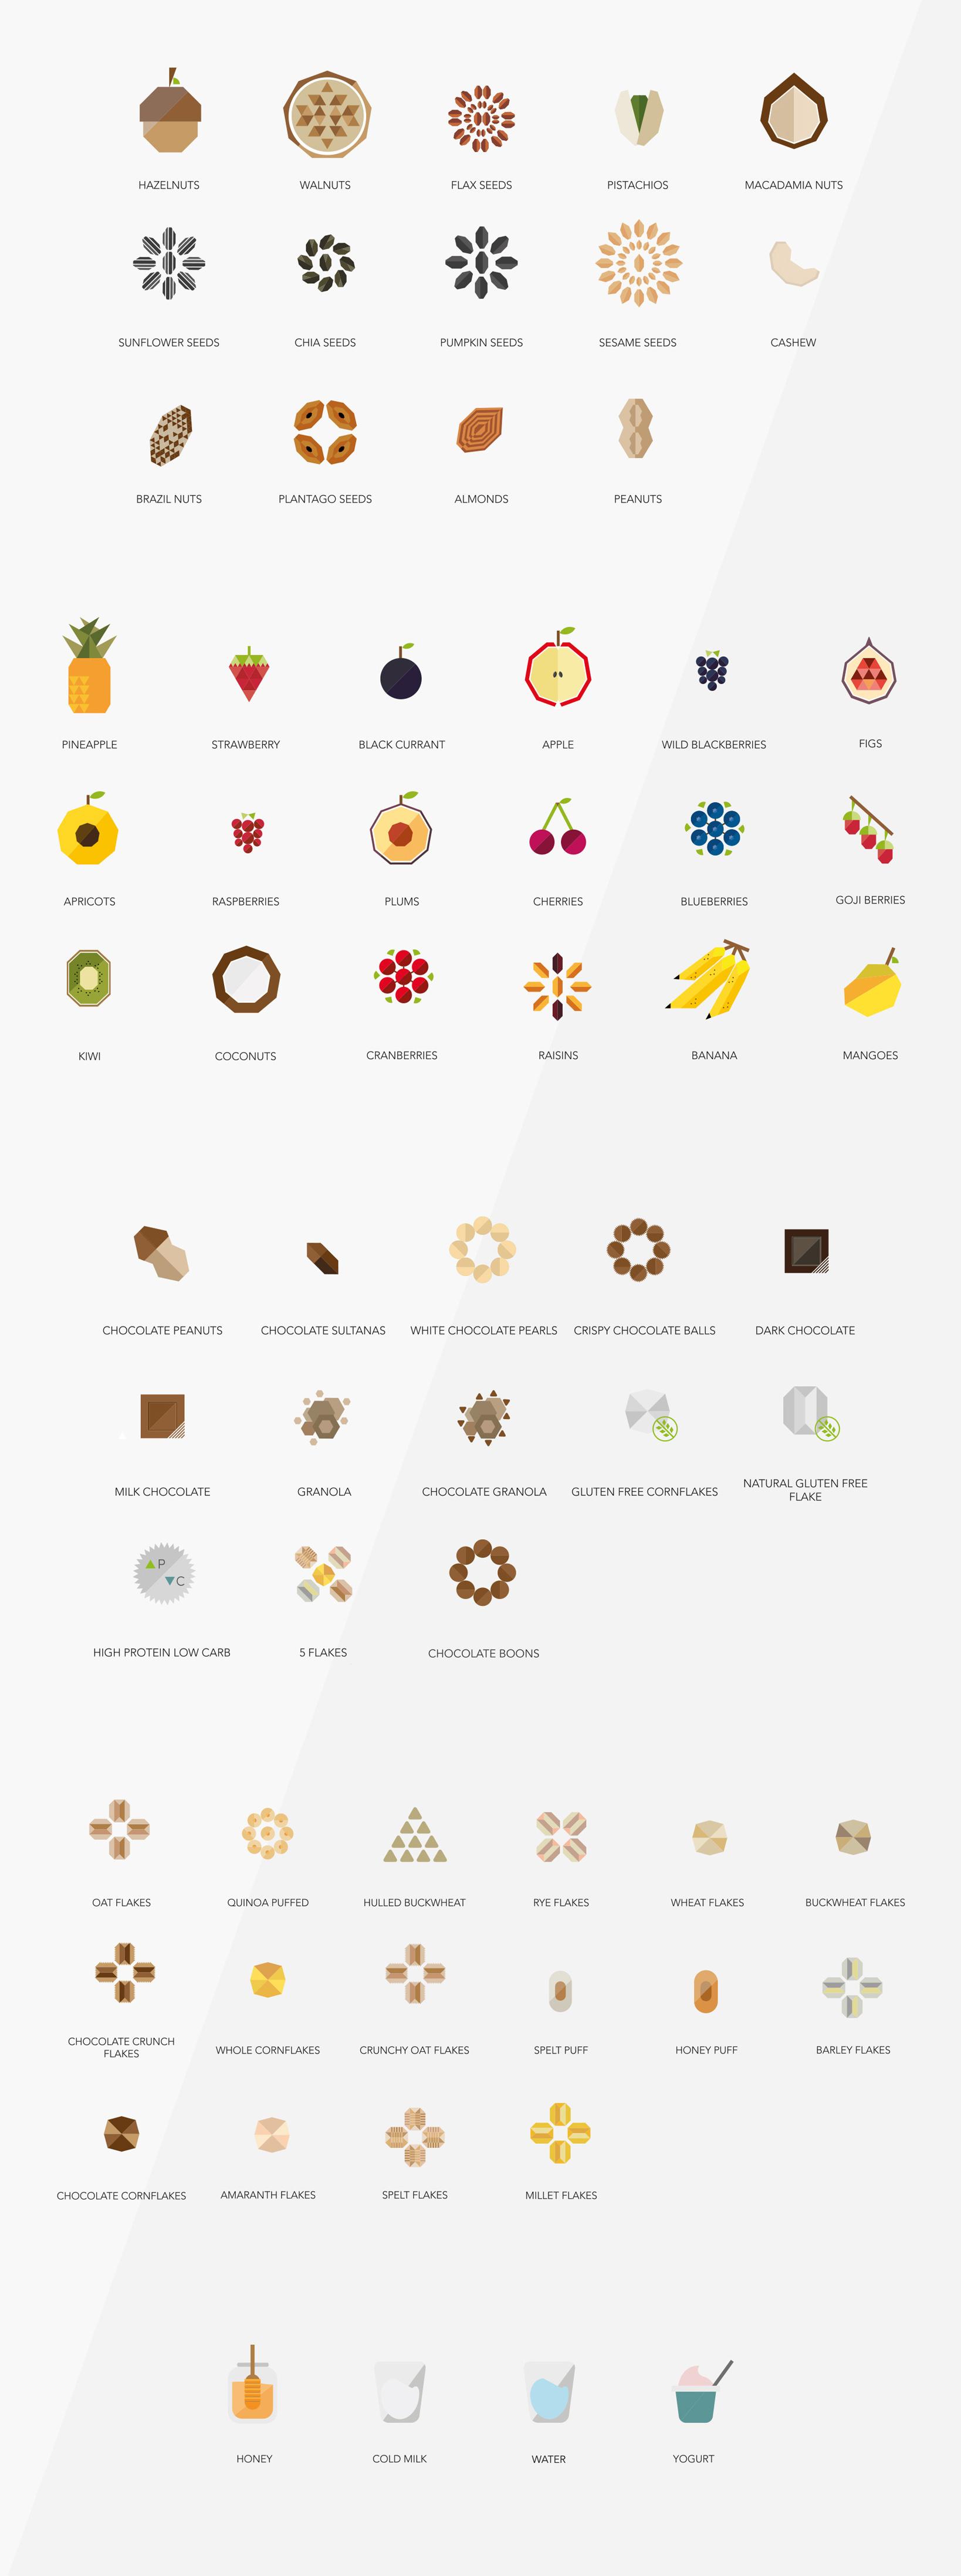 allIcons-5stripes.jpg